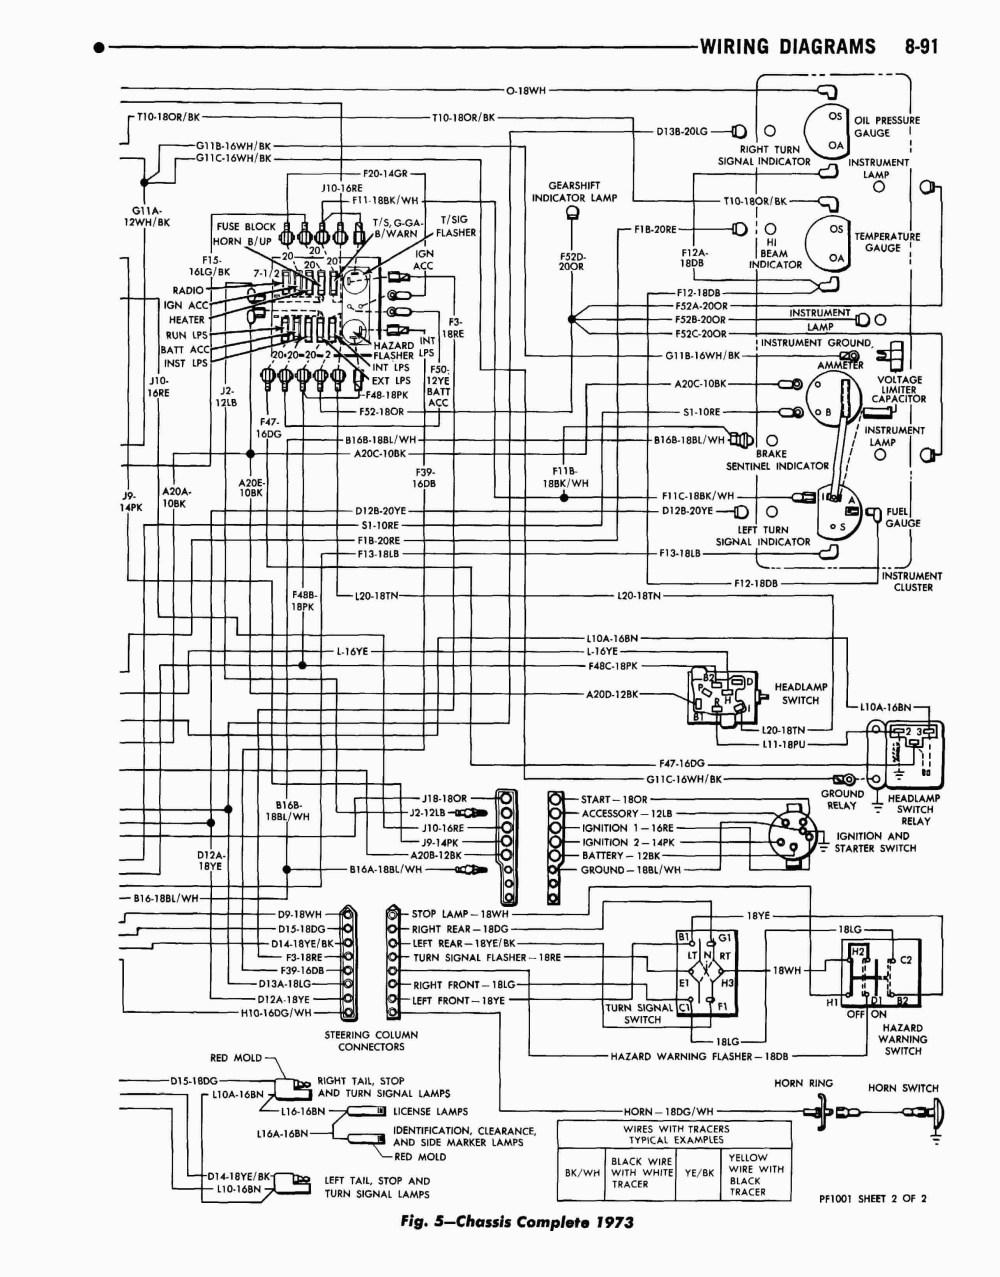 medium resolution of seadoo 951 carb diagram 2000 seadoo gtx carb diagram wiring2004 sea doo sportster wiring diagram